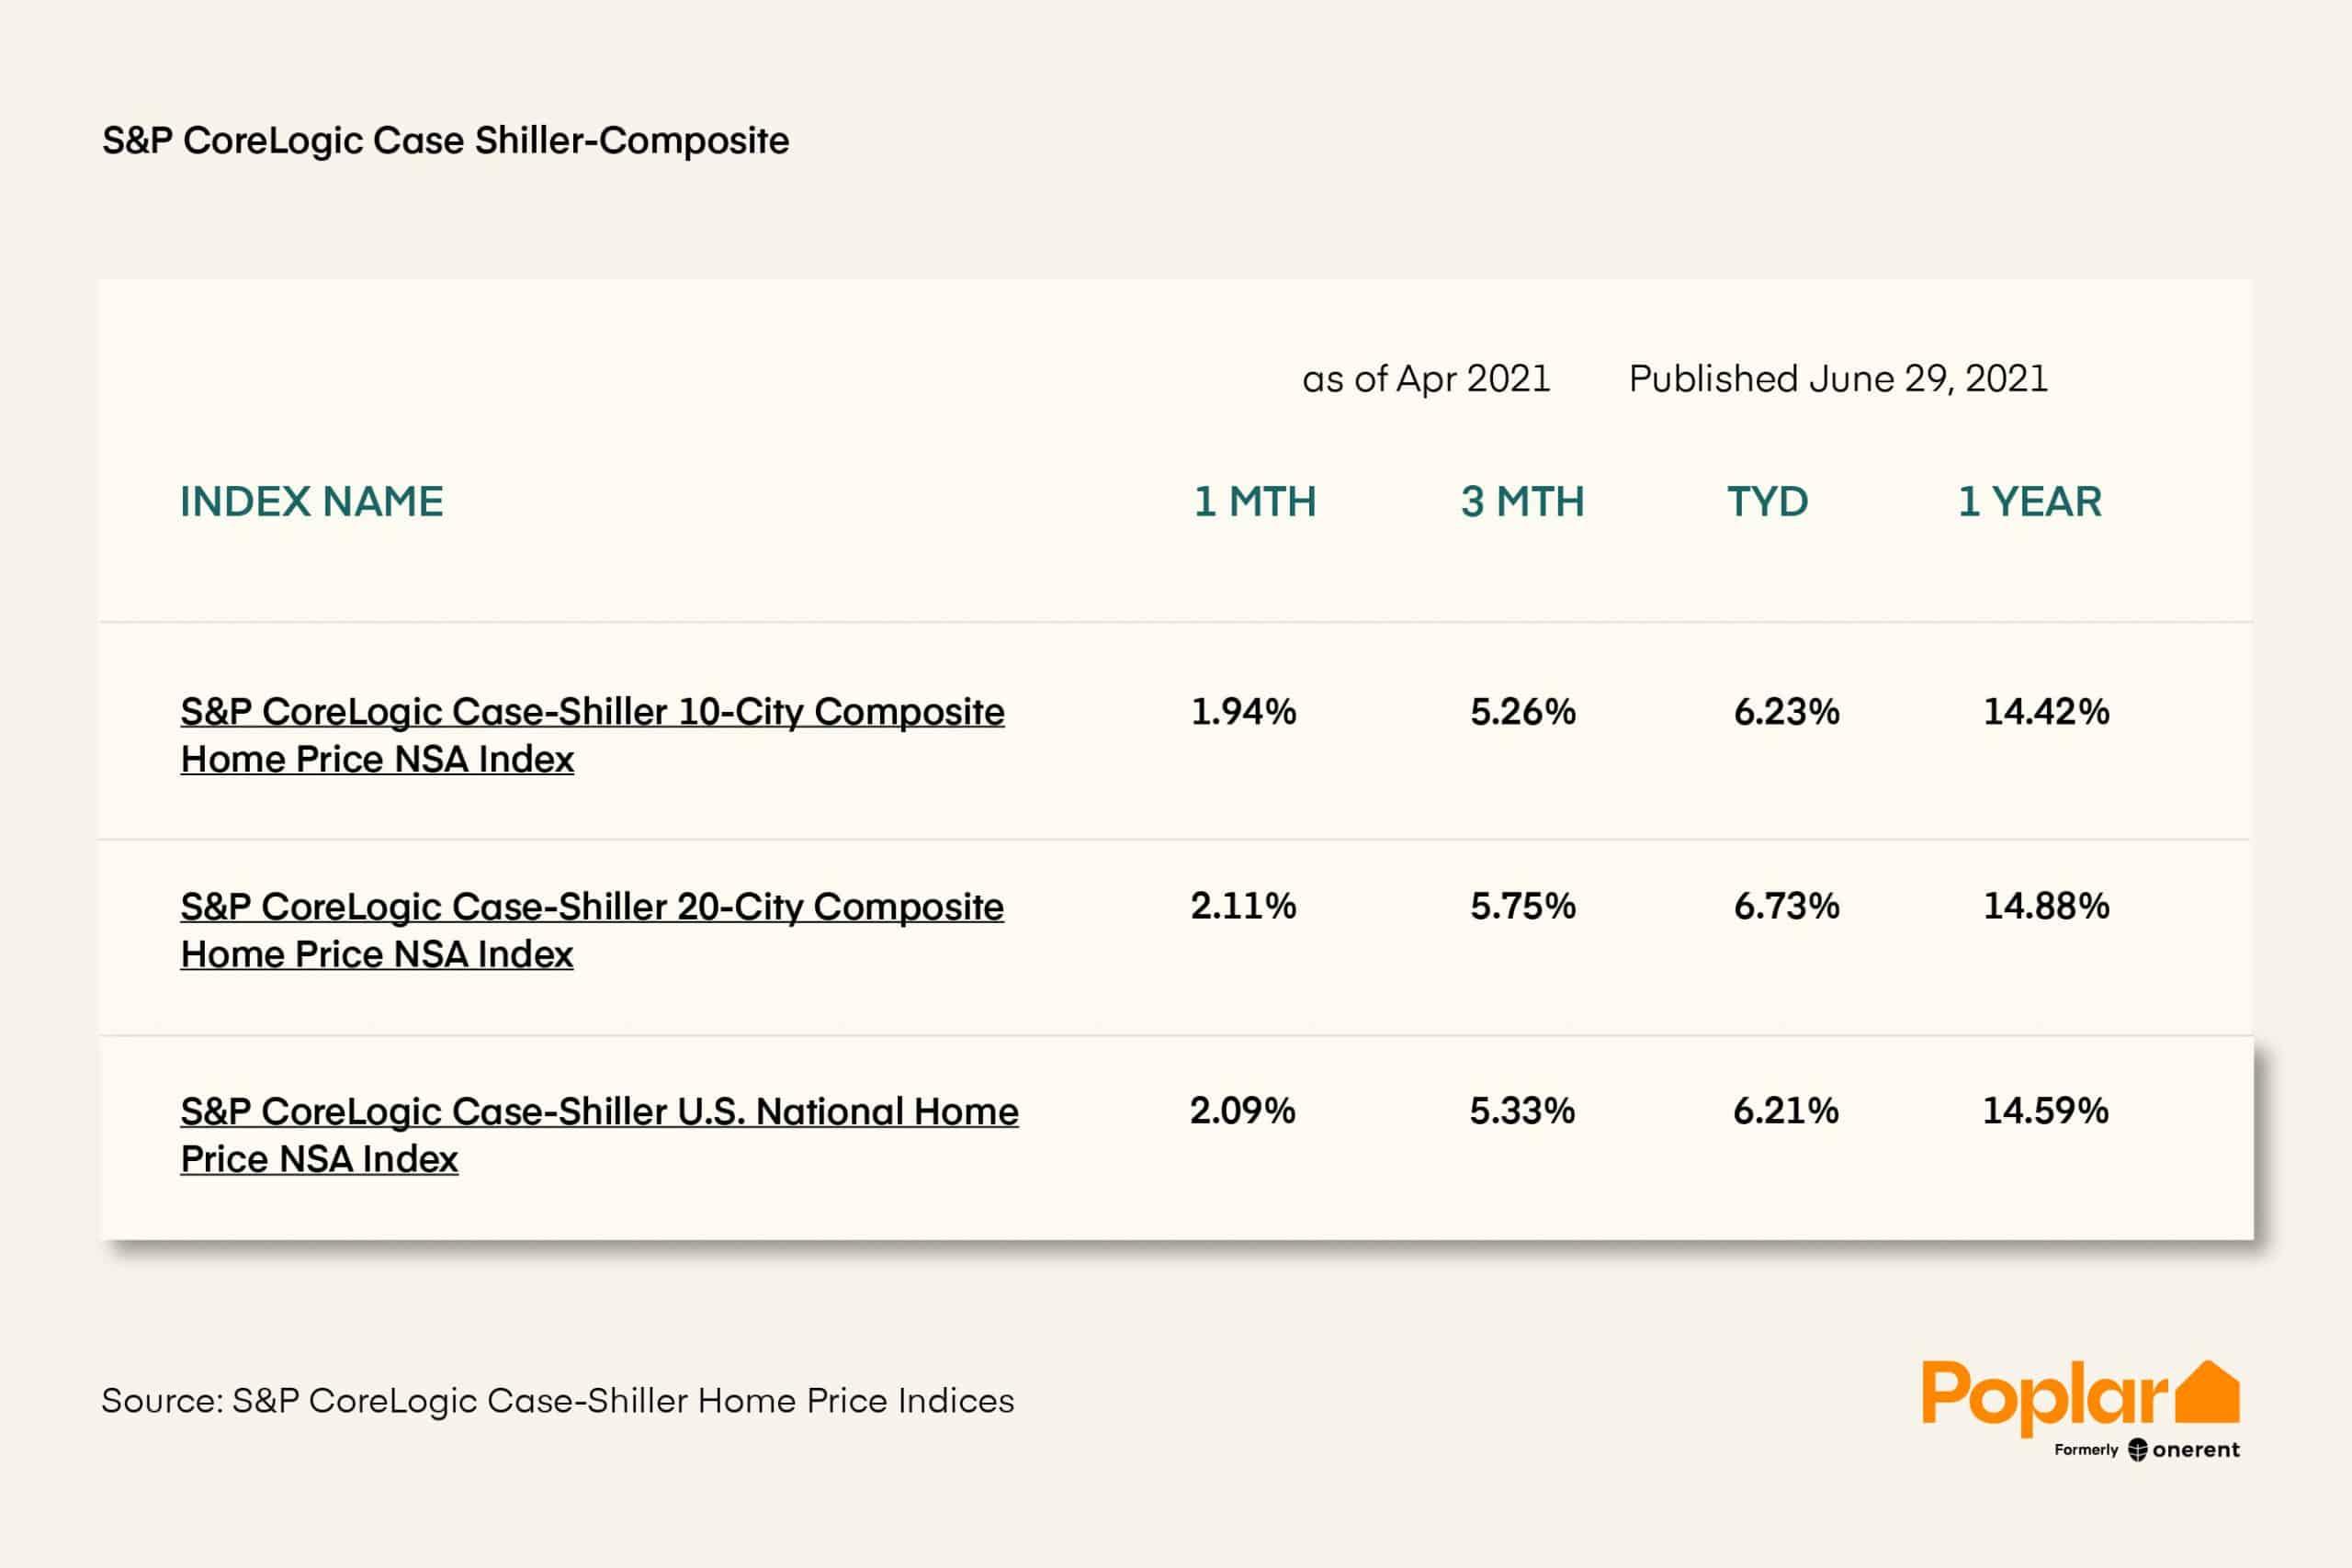 S&P CoreLogic Case Shiller Composite